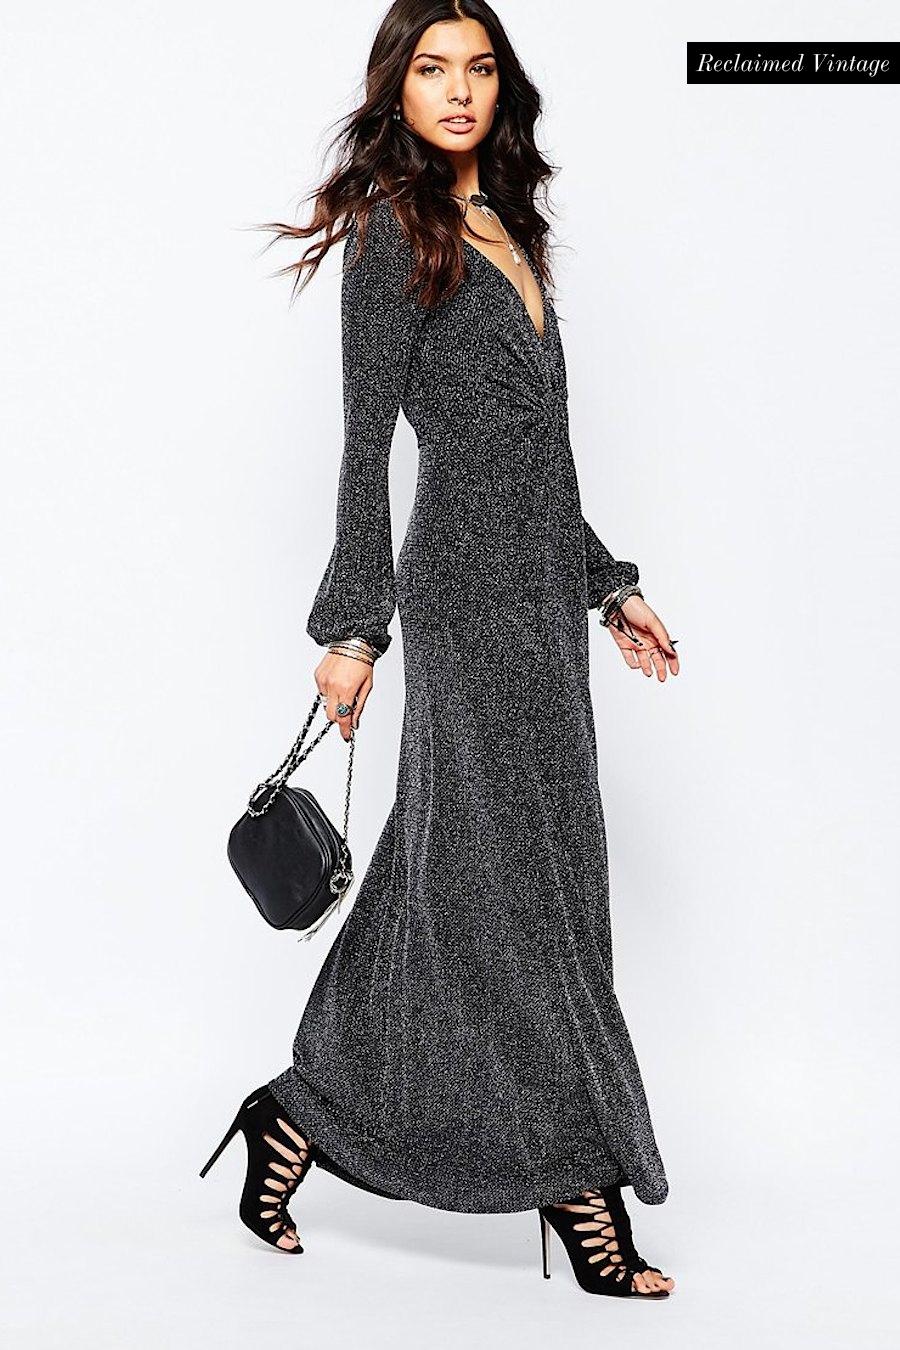 Maxi dress under 200 fash-n-chips.com 15